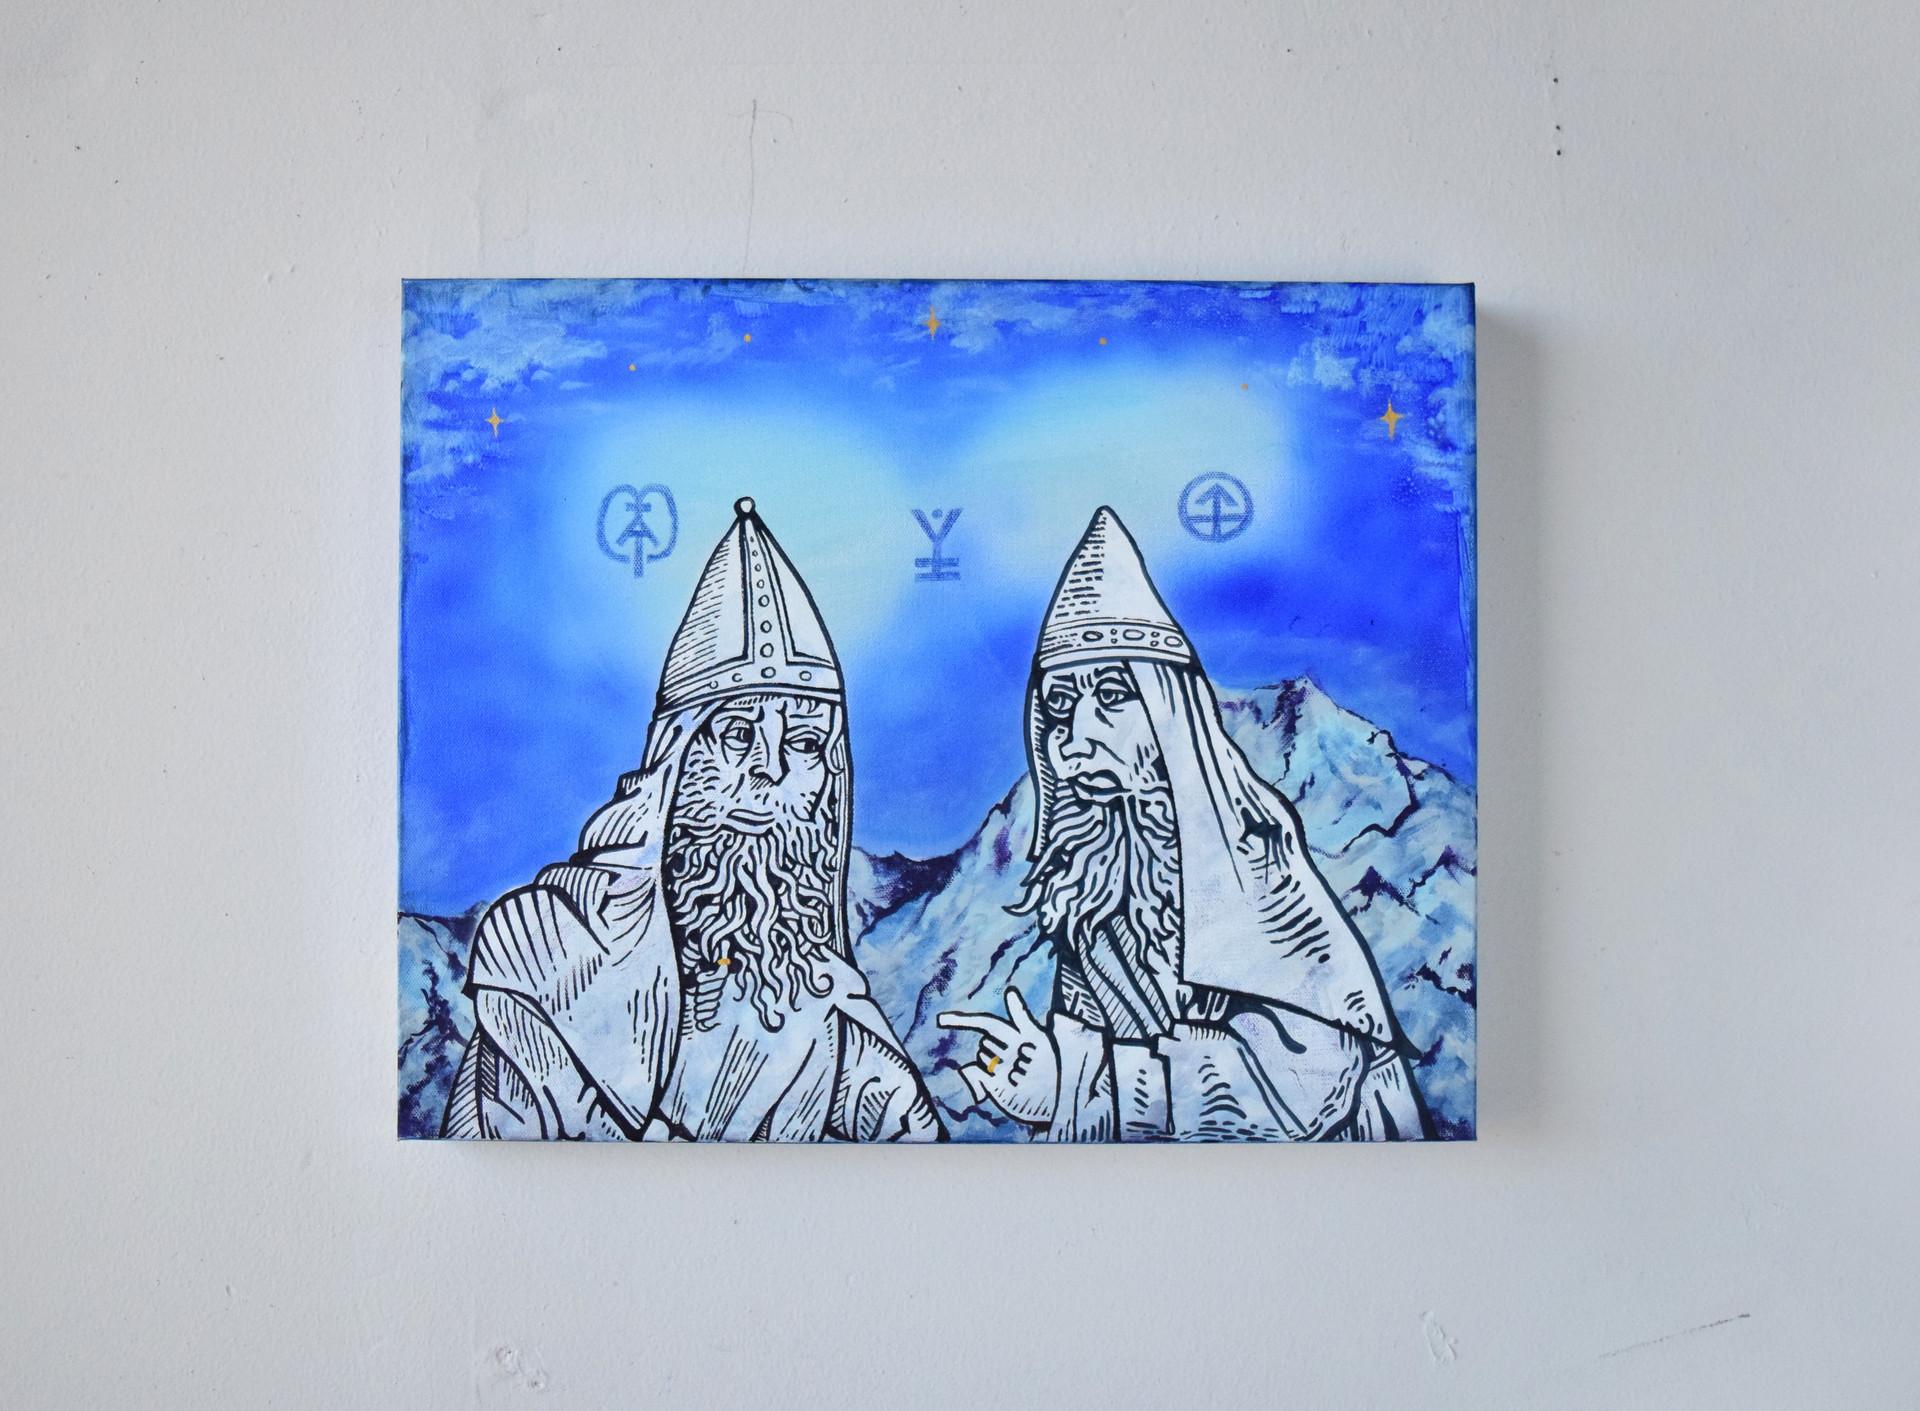 Philosophers Discuss Mountaintops